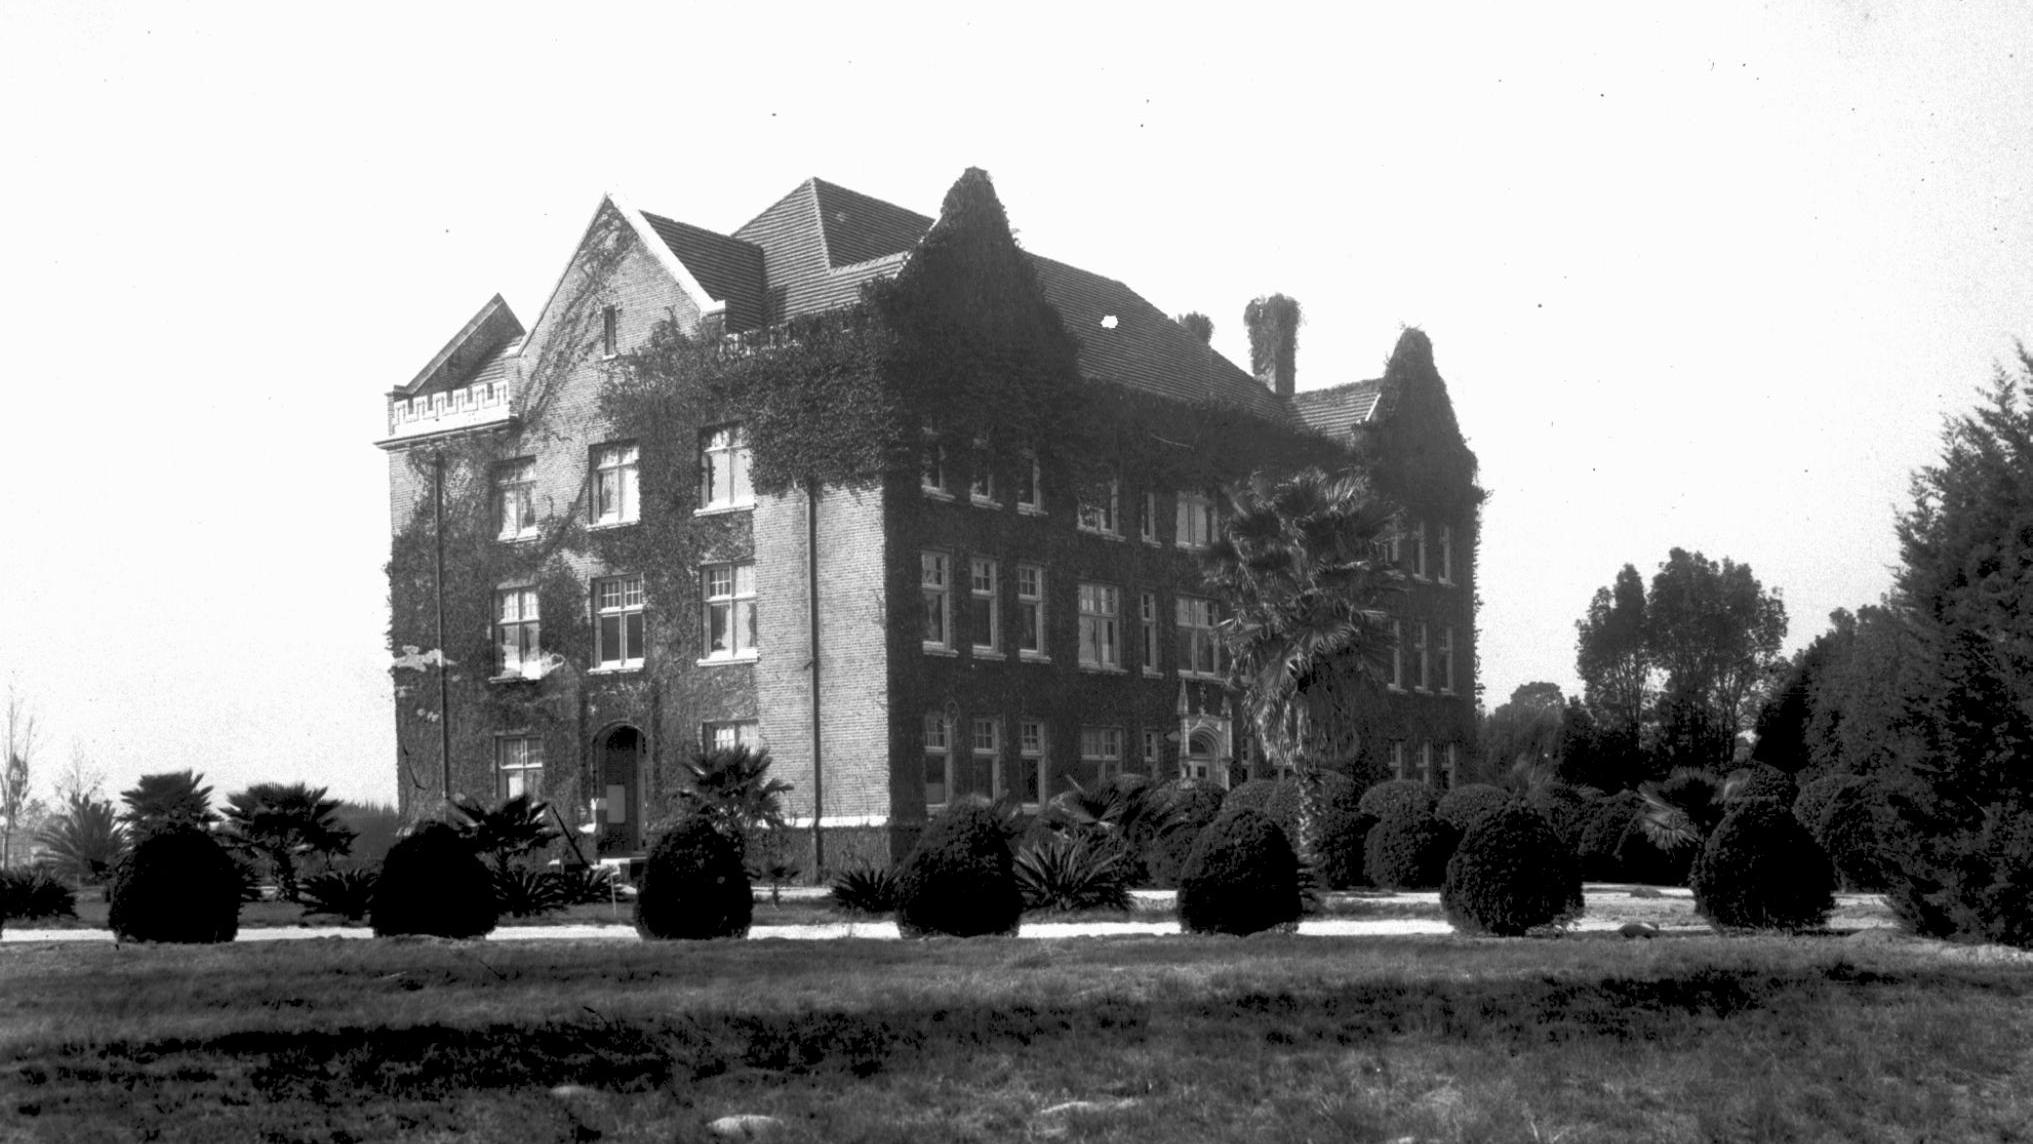 Newell Hall 1930s